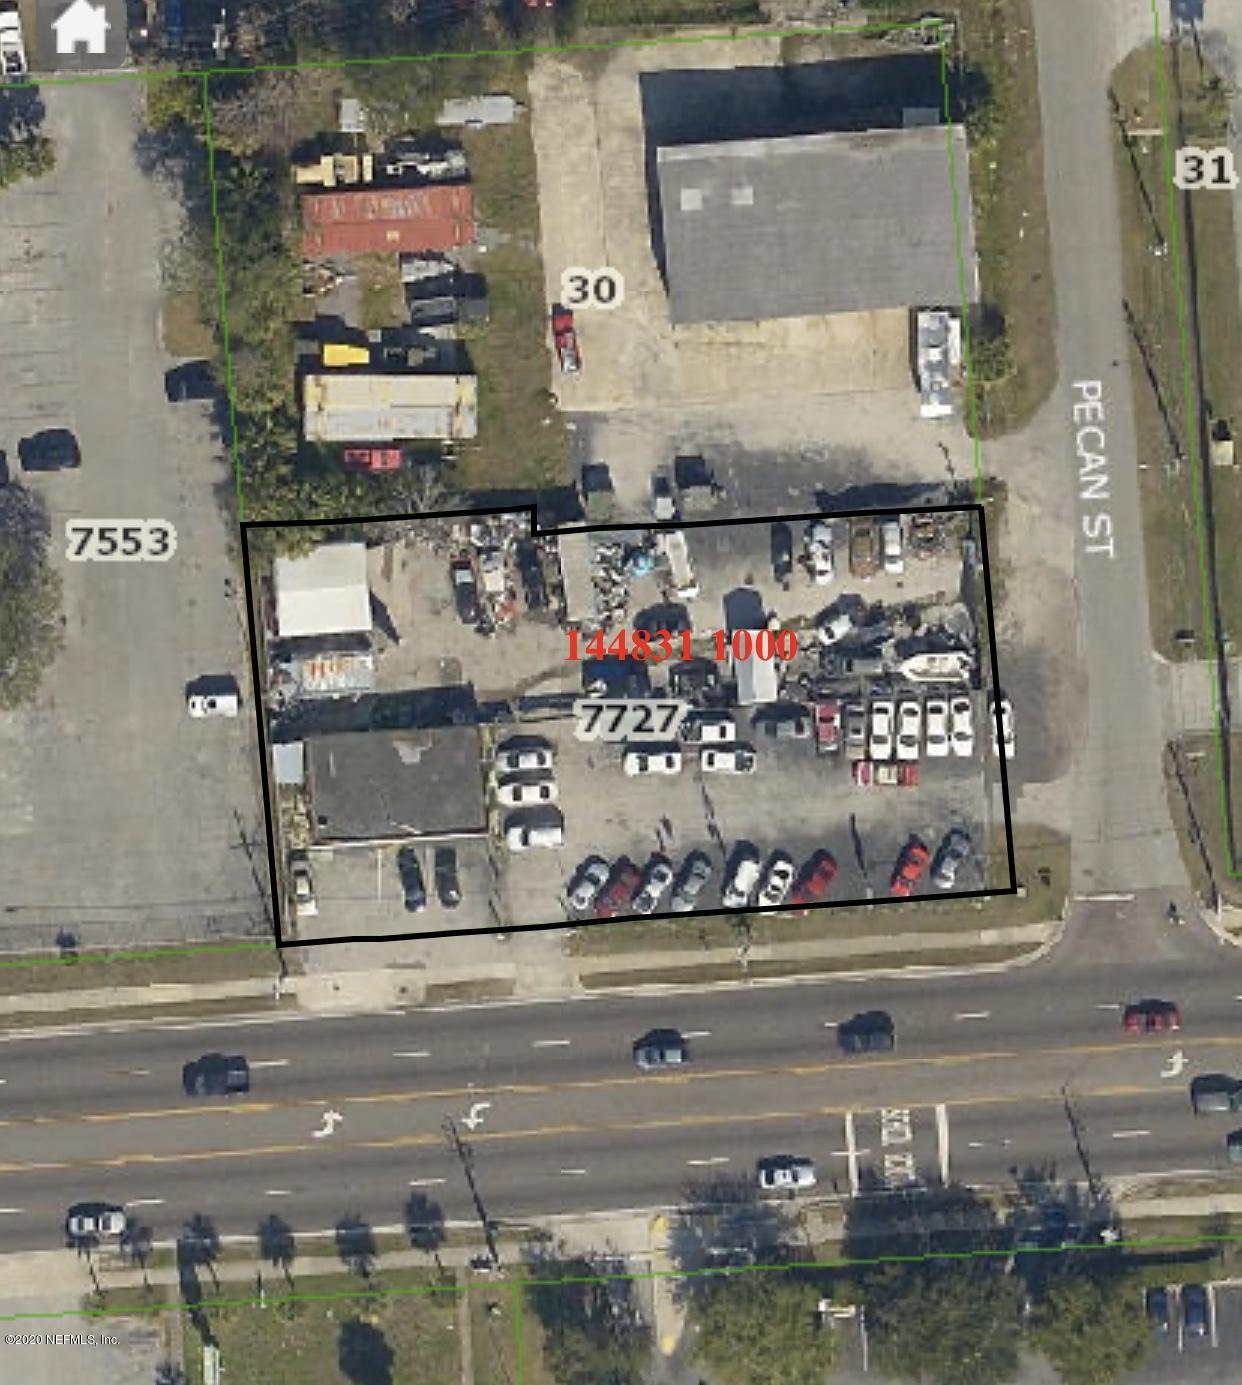 7727 ATLANTIC, JACKSONVILLE, FLORIDA 32211, ,Commercial,For sale,ATLANTIC,1048460